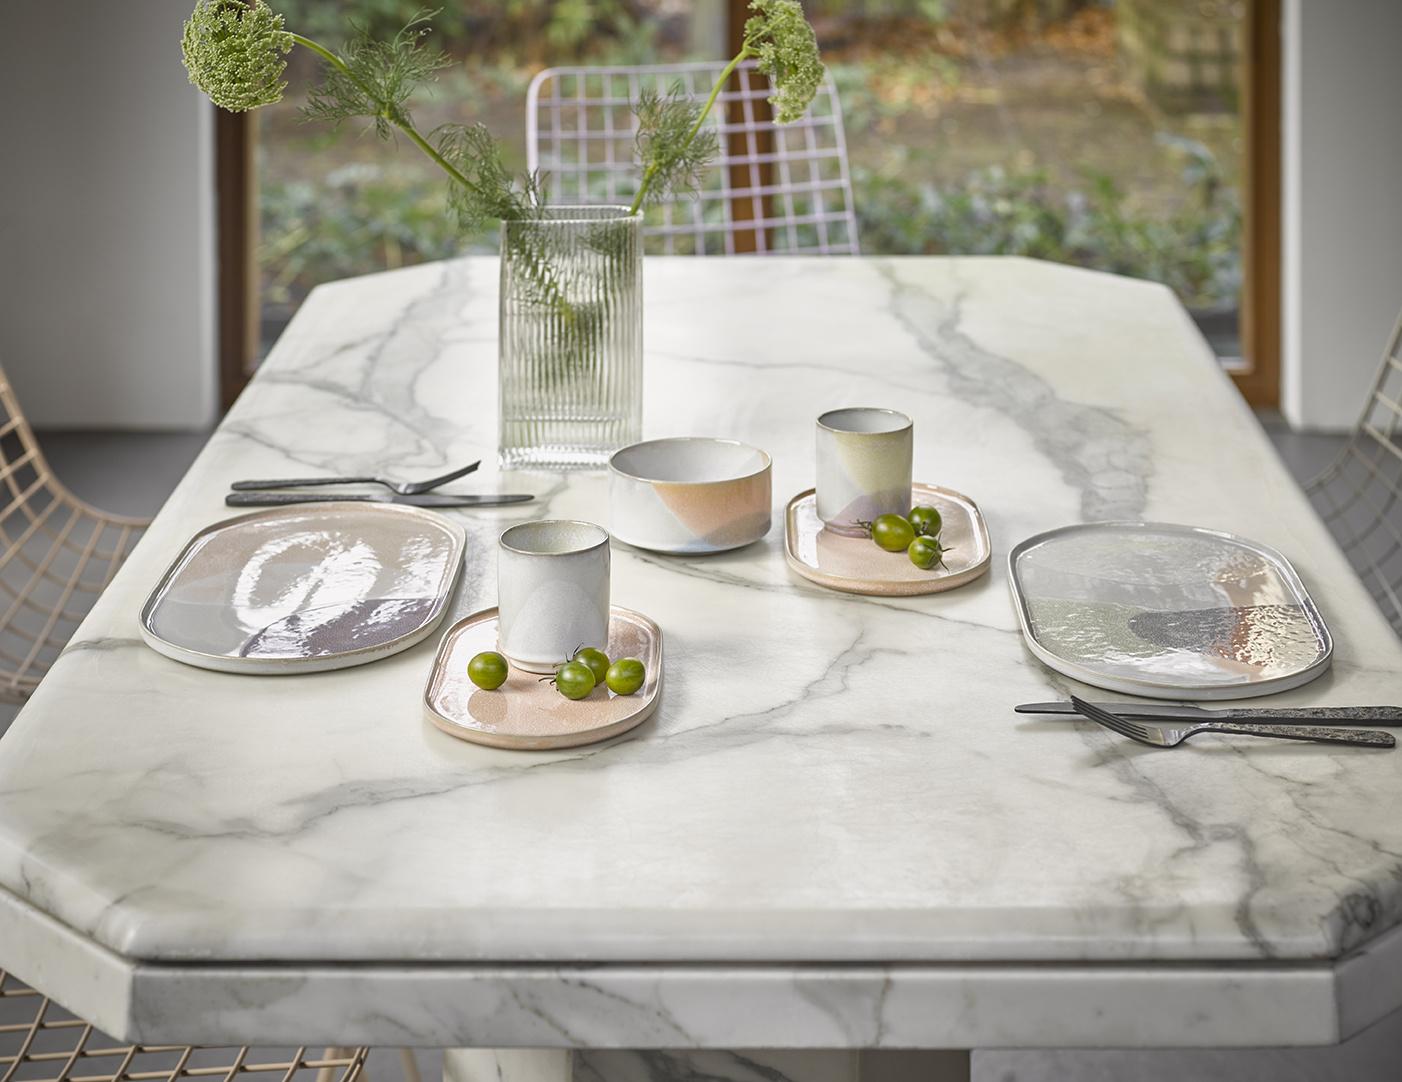 Bord gallery ceramics: oval side plate peach-2